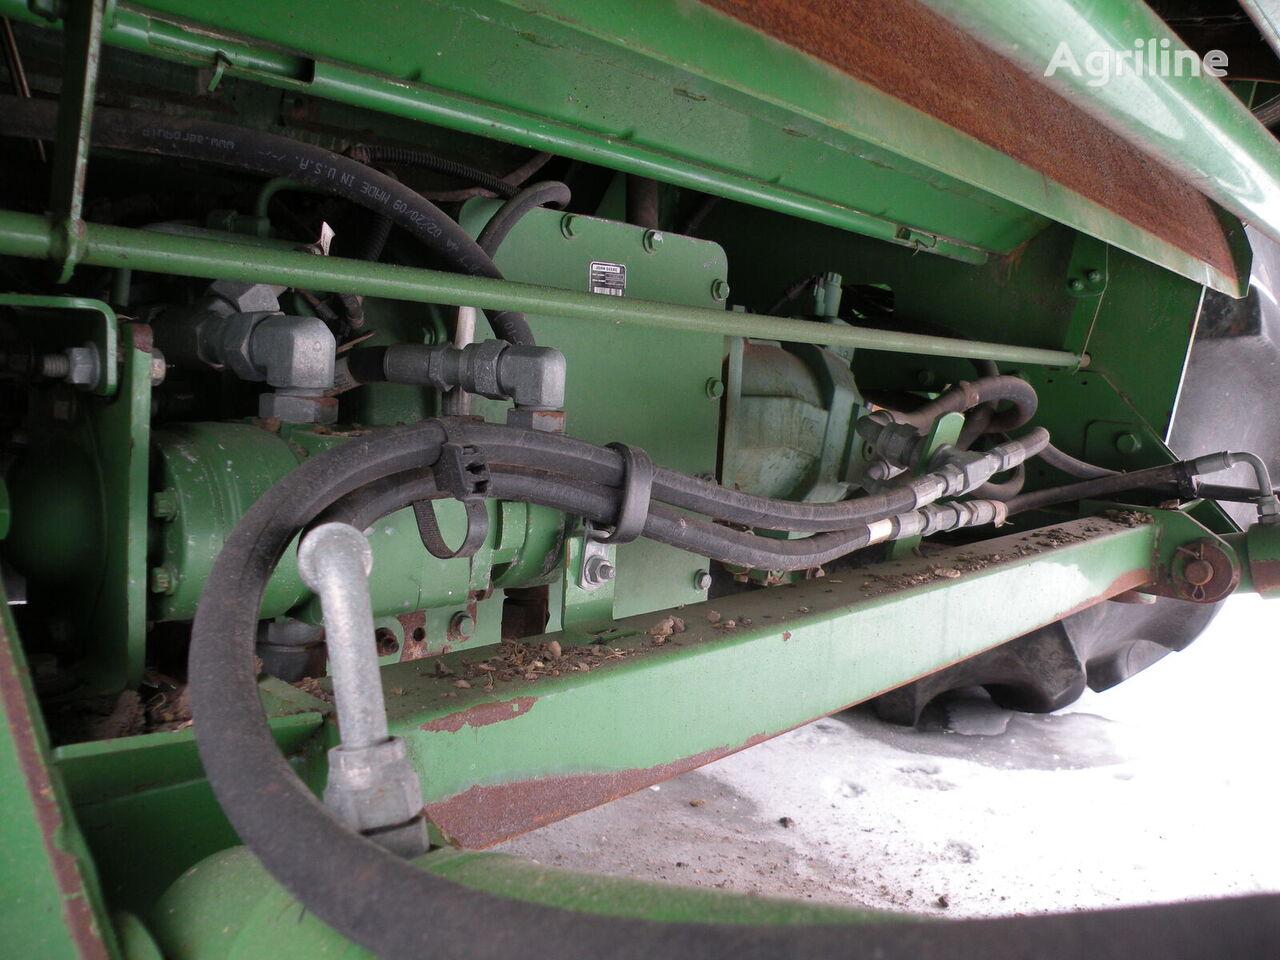 RAUCH AXIS H 30.1 EMC + W fertiliser spreader